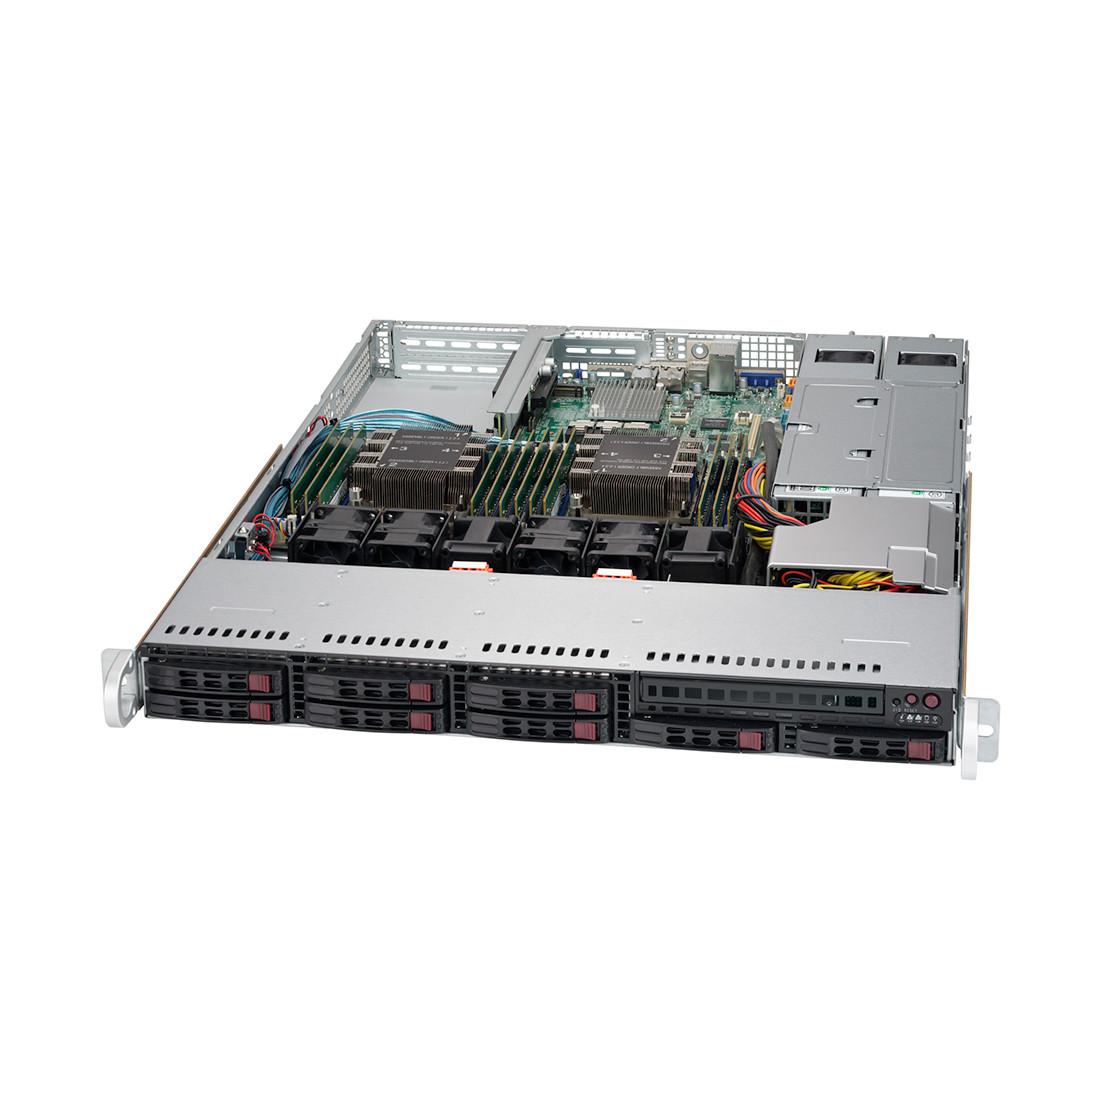 Серверная платформа SUPERMICRO SYS-1029P-WTR